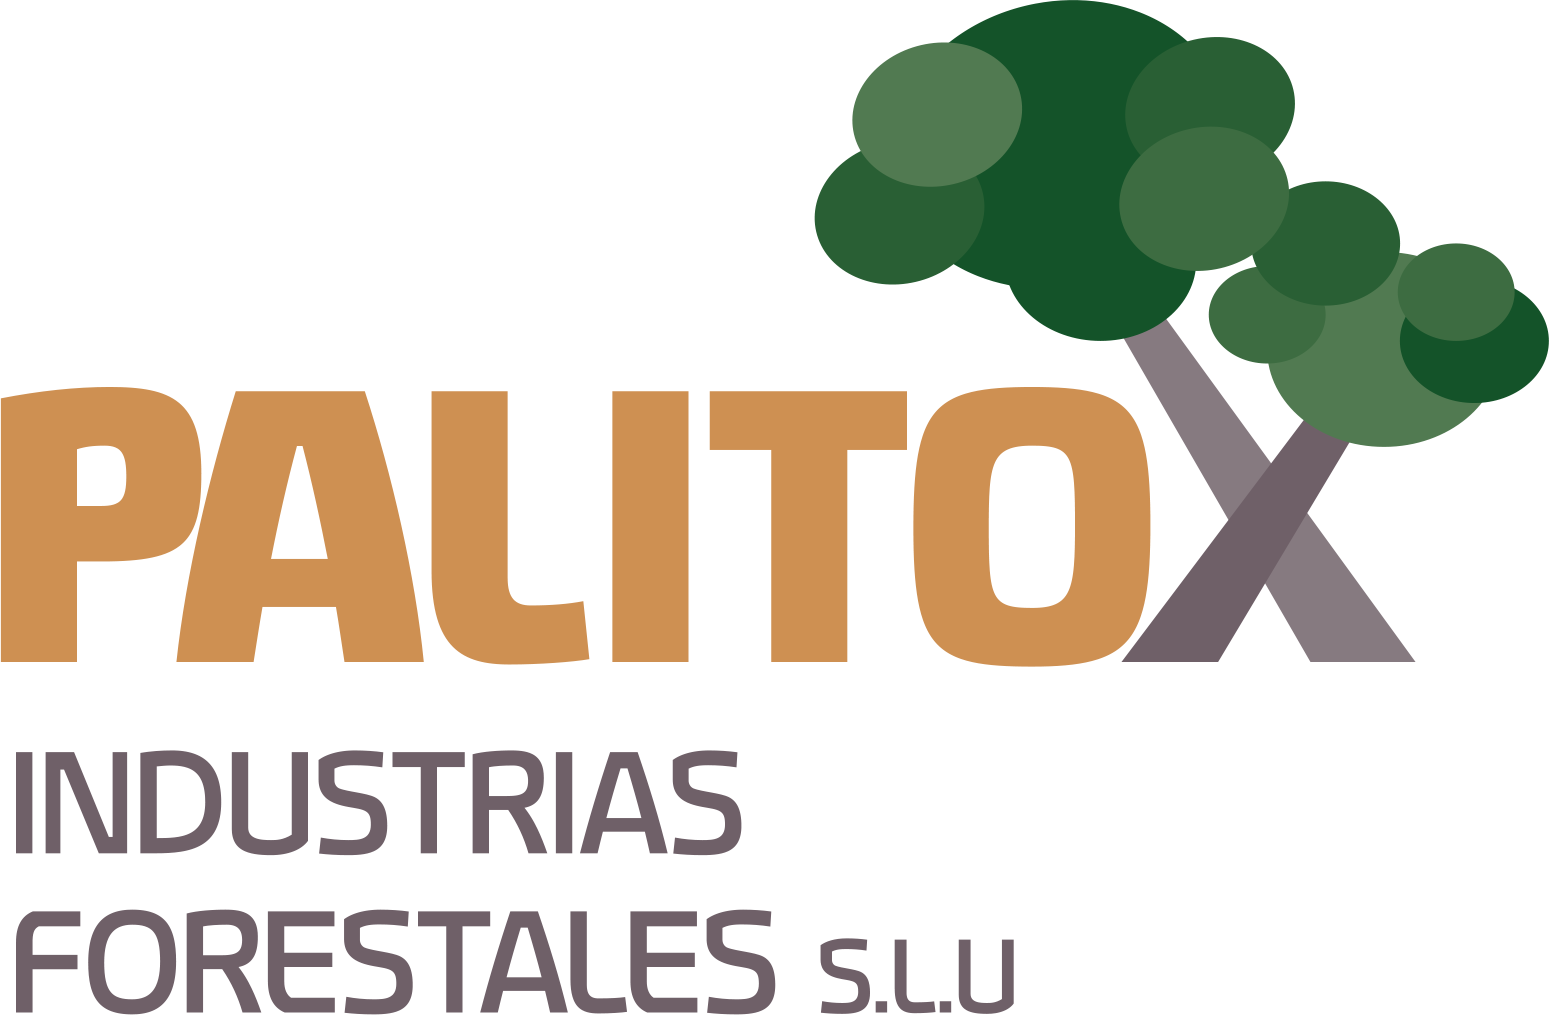 Palitox